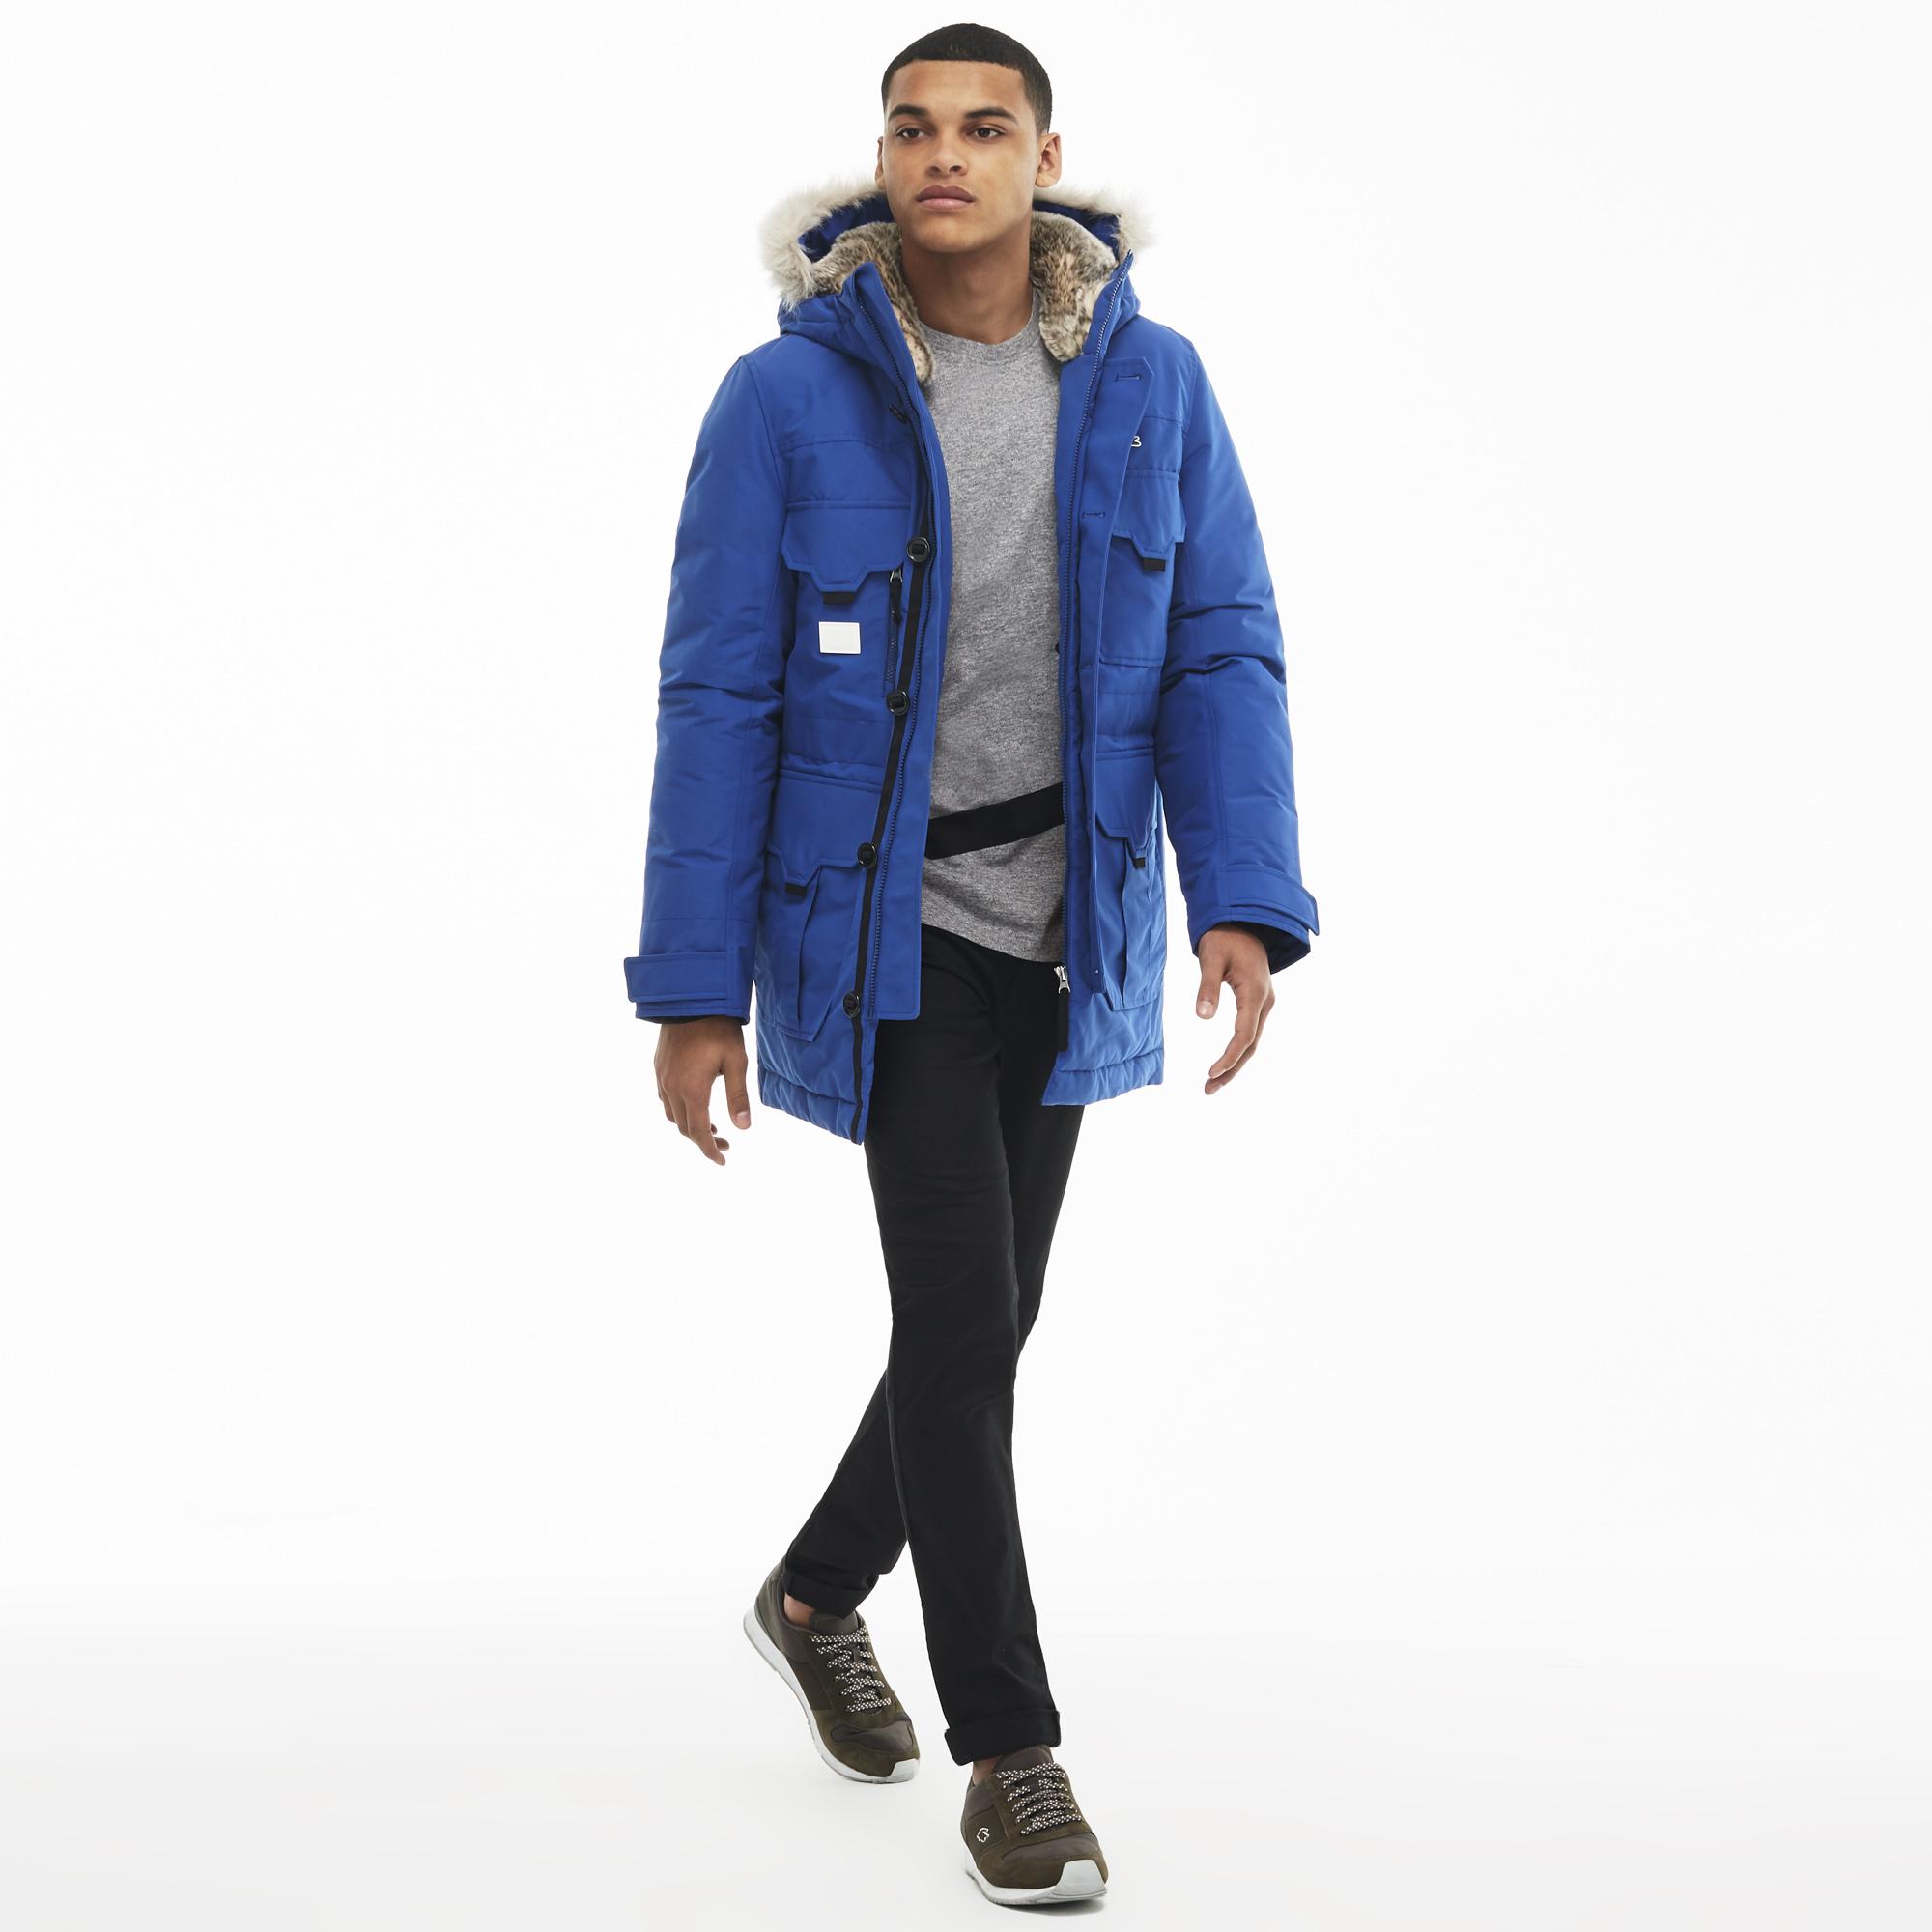 Куртка LacosteВерхняя одежда<br>100%полиэстер/100%полиамид/67%вискоза29%полиамид 4%эластан/82% акрилин 18%полиэстер/35акрилин 35%модакрил 30%полиэстер/70%пух 30%перо